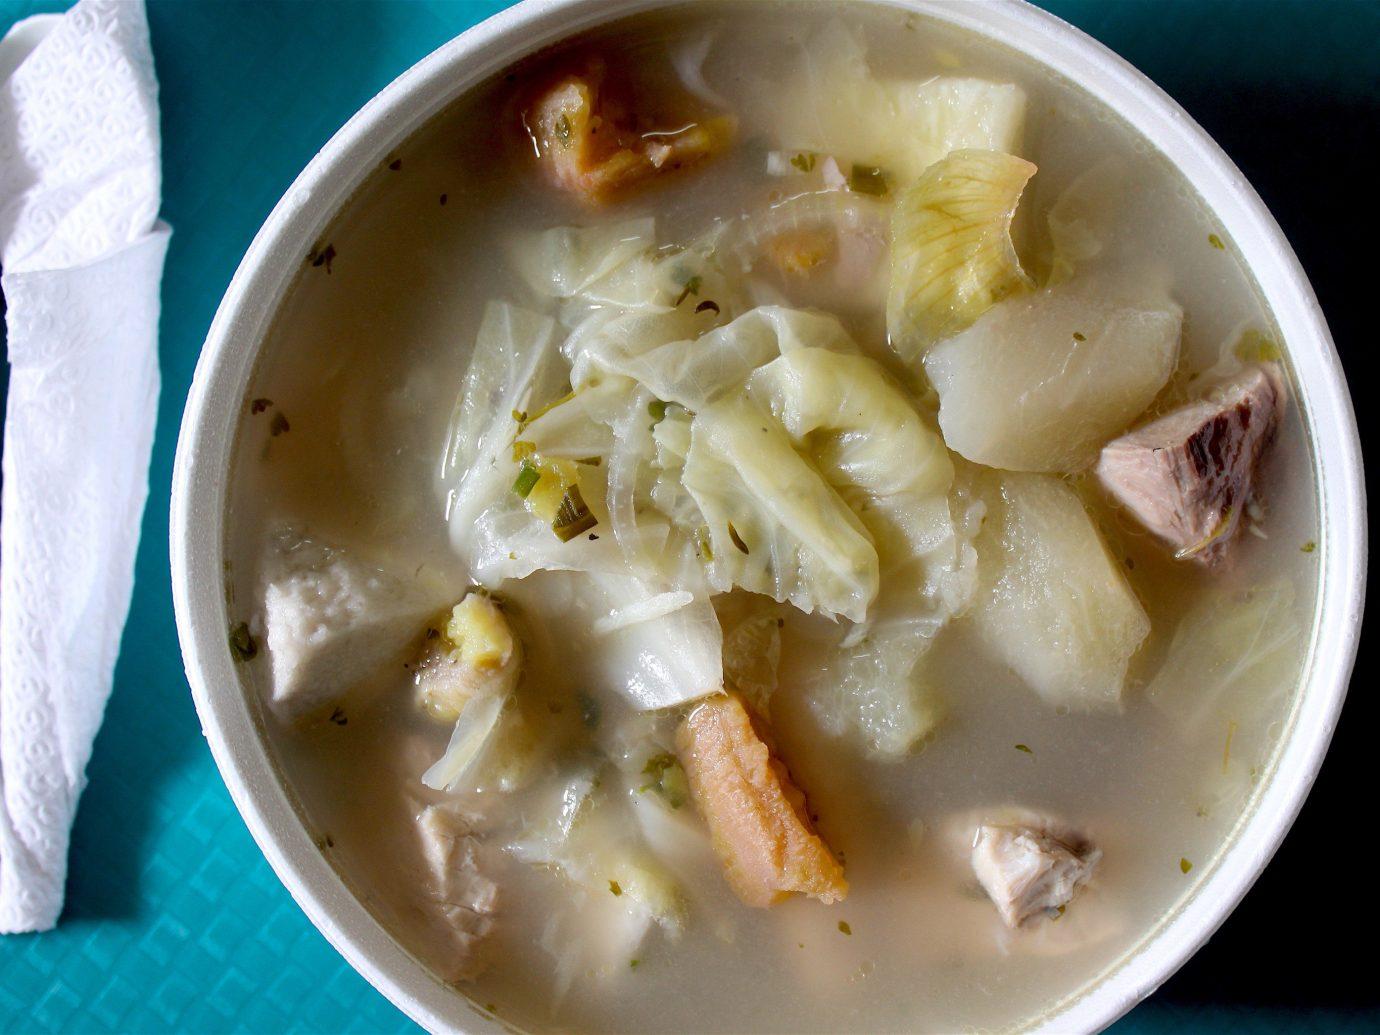 Trip Ideas food dish bowl plate soup clam chowder cuisine produce vegetable